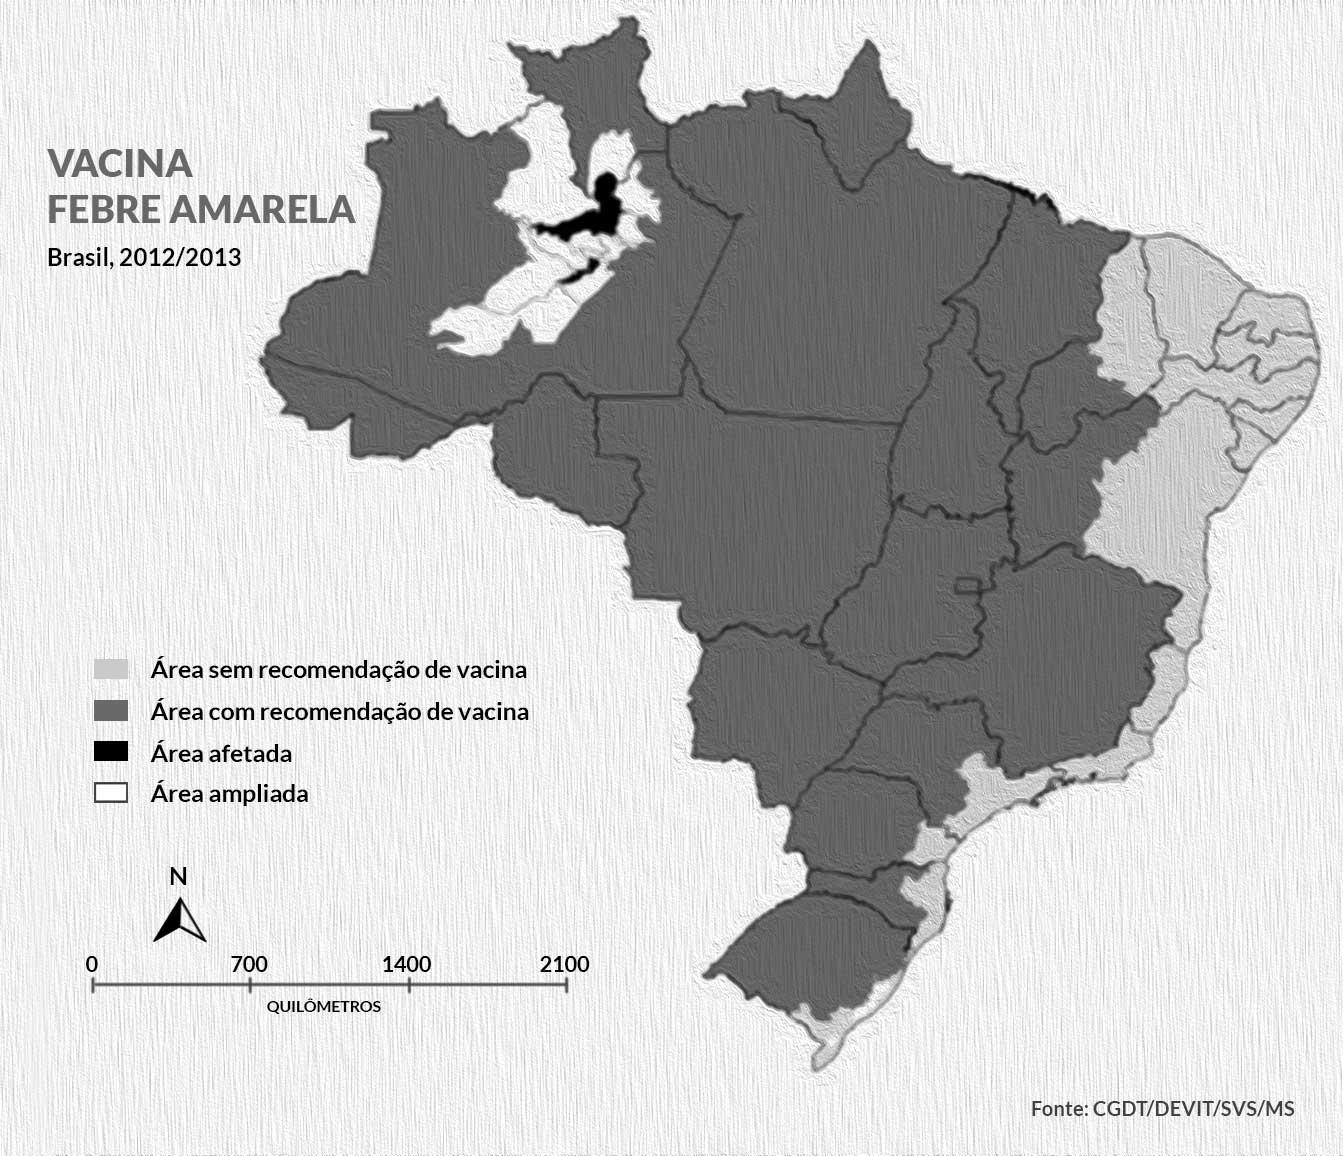 vacina febre amarela svs ms brasil 2012 2013